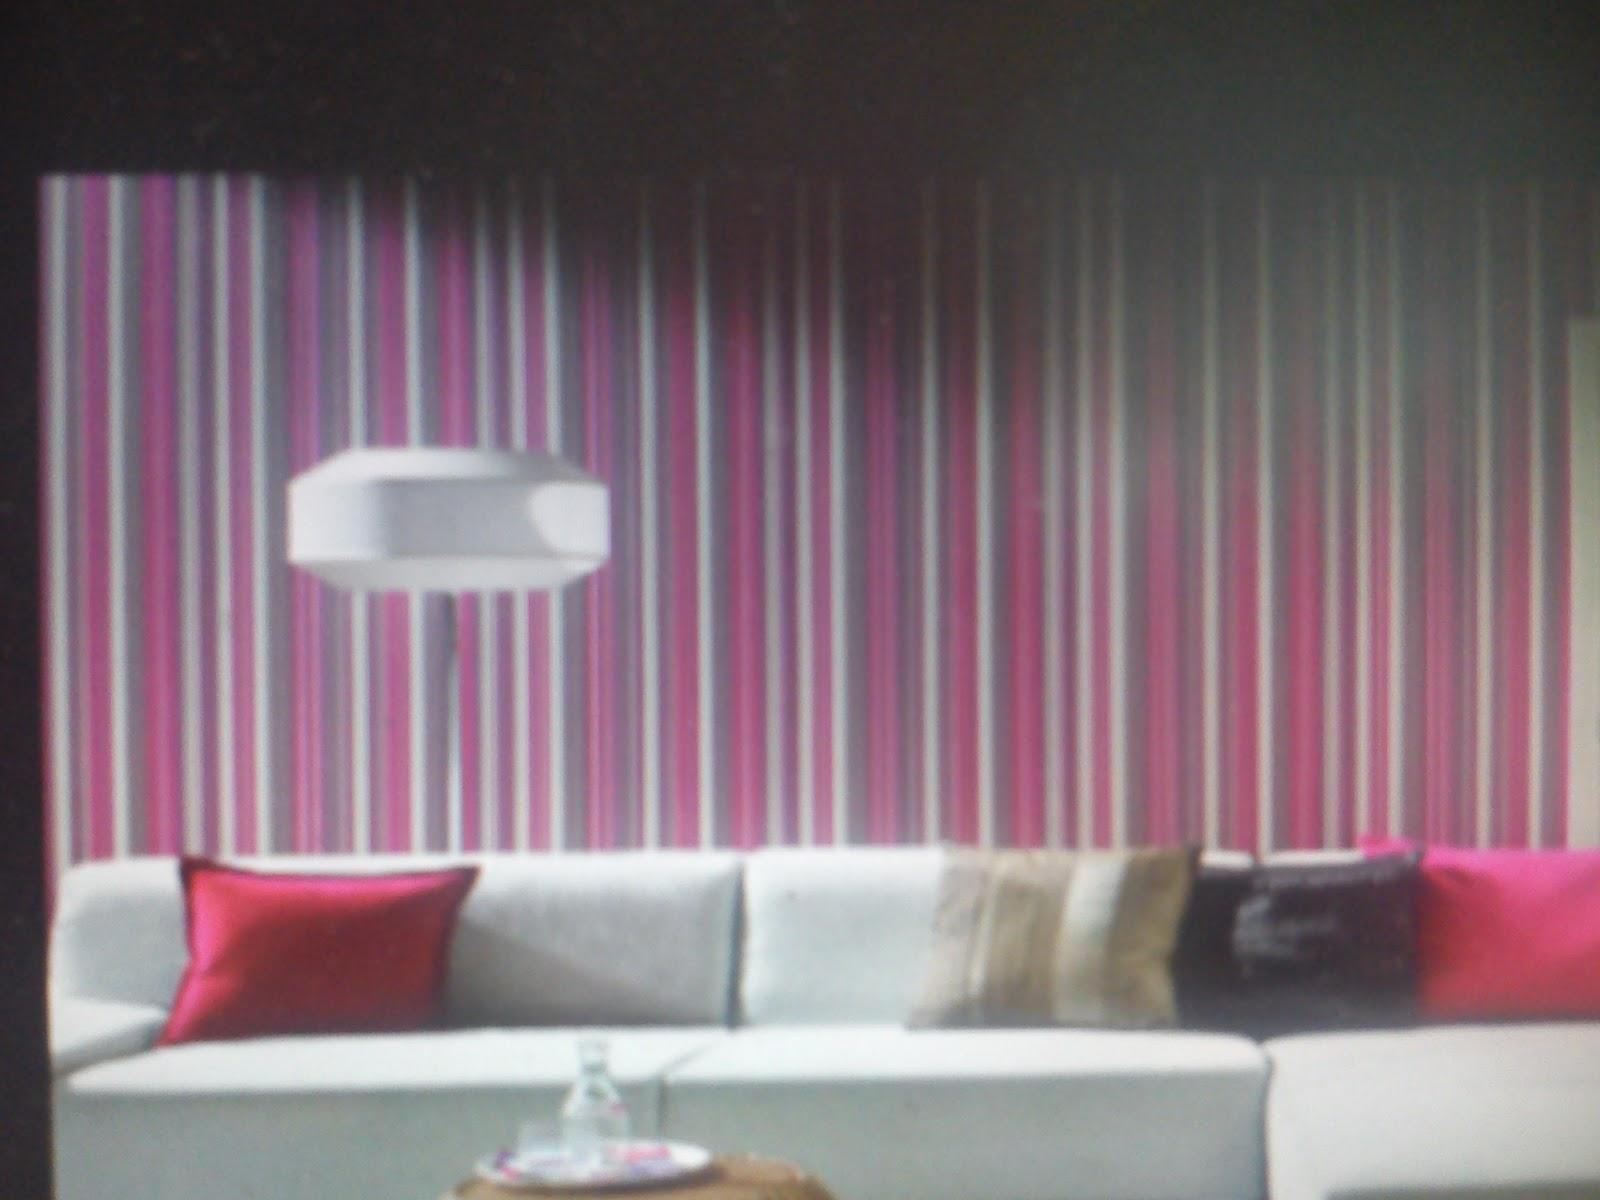 Kemudian Dapatkan Warna Skima Or Colour Schemes Yang Sesuai Dengan Sofa Langsir Kaler Perabot Ada Dalam Rumah Anda Tu Supaya Match Dgn Dinding